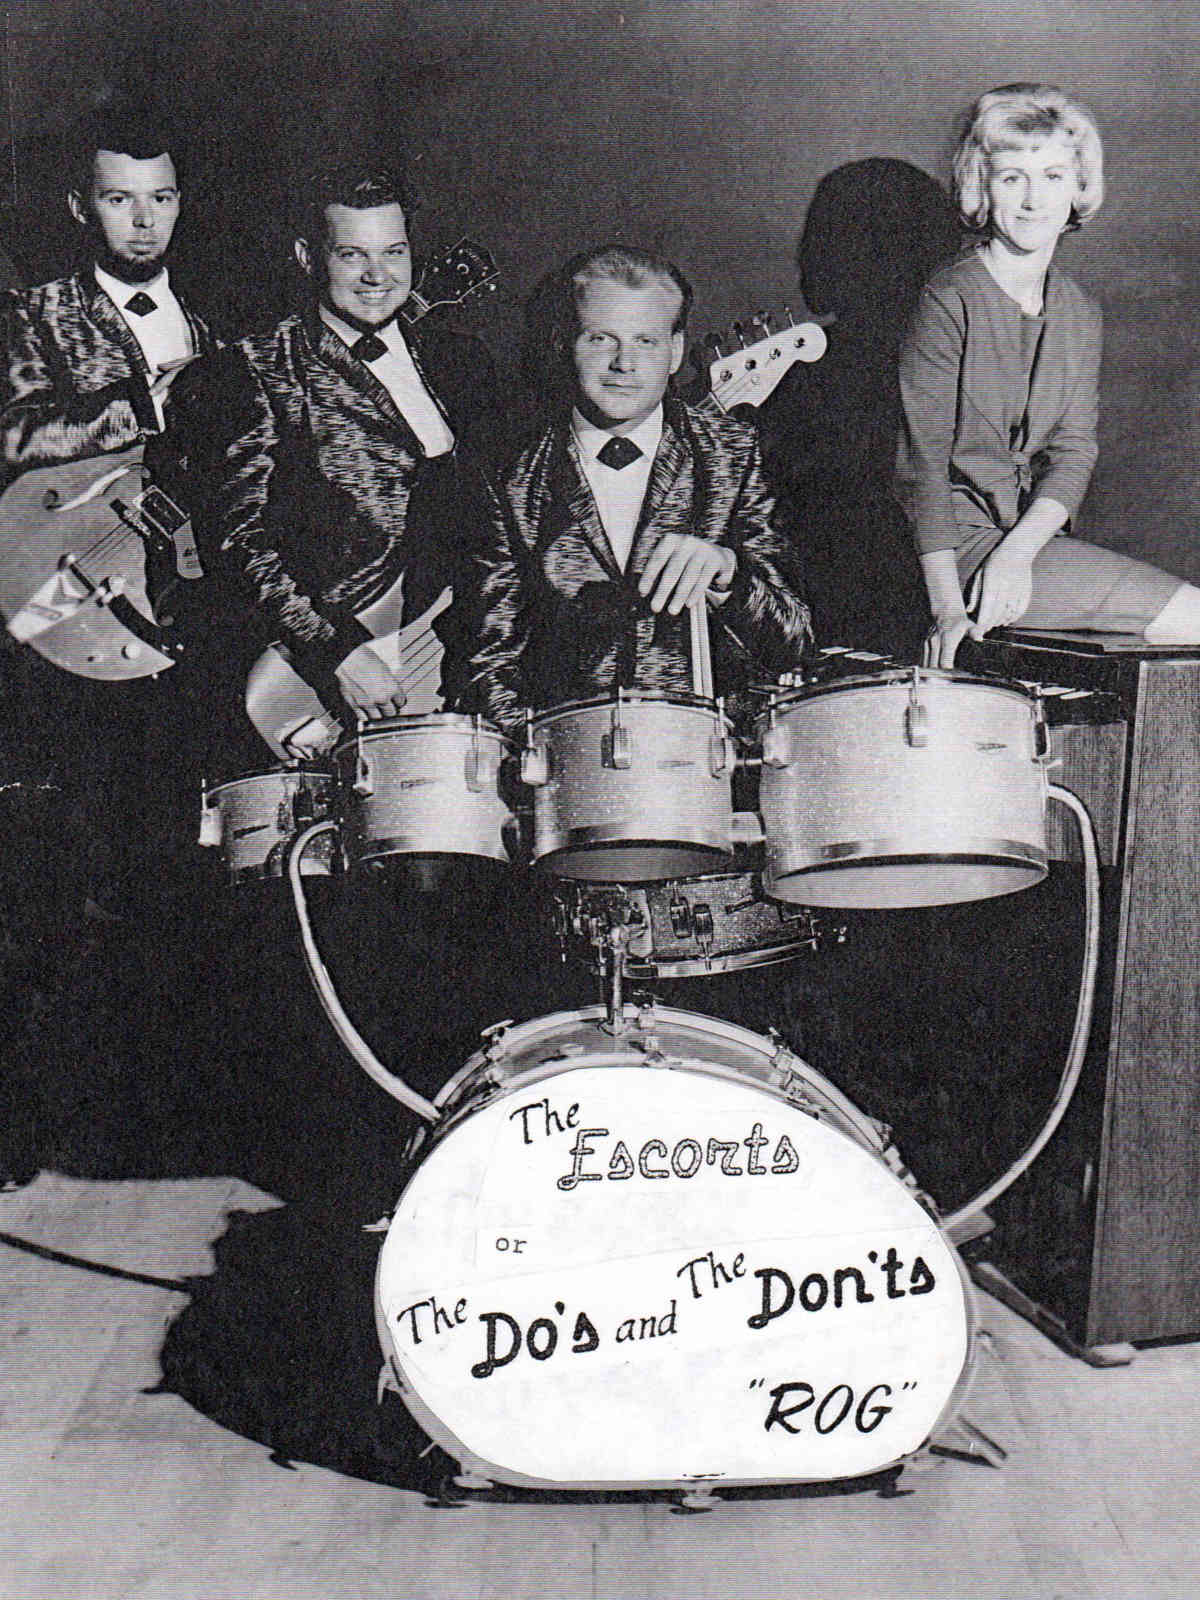 The Do's & Don'ts Band original members: Dick Burns, Dick Sherman, Roger Booth, and Zelda Sherman.